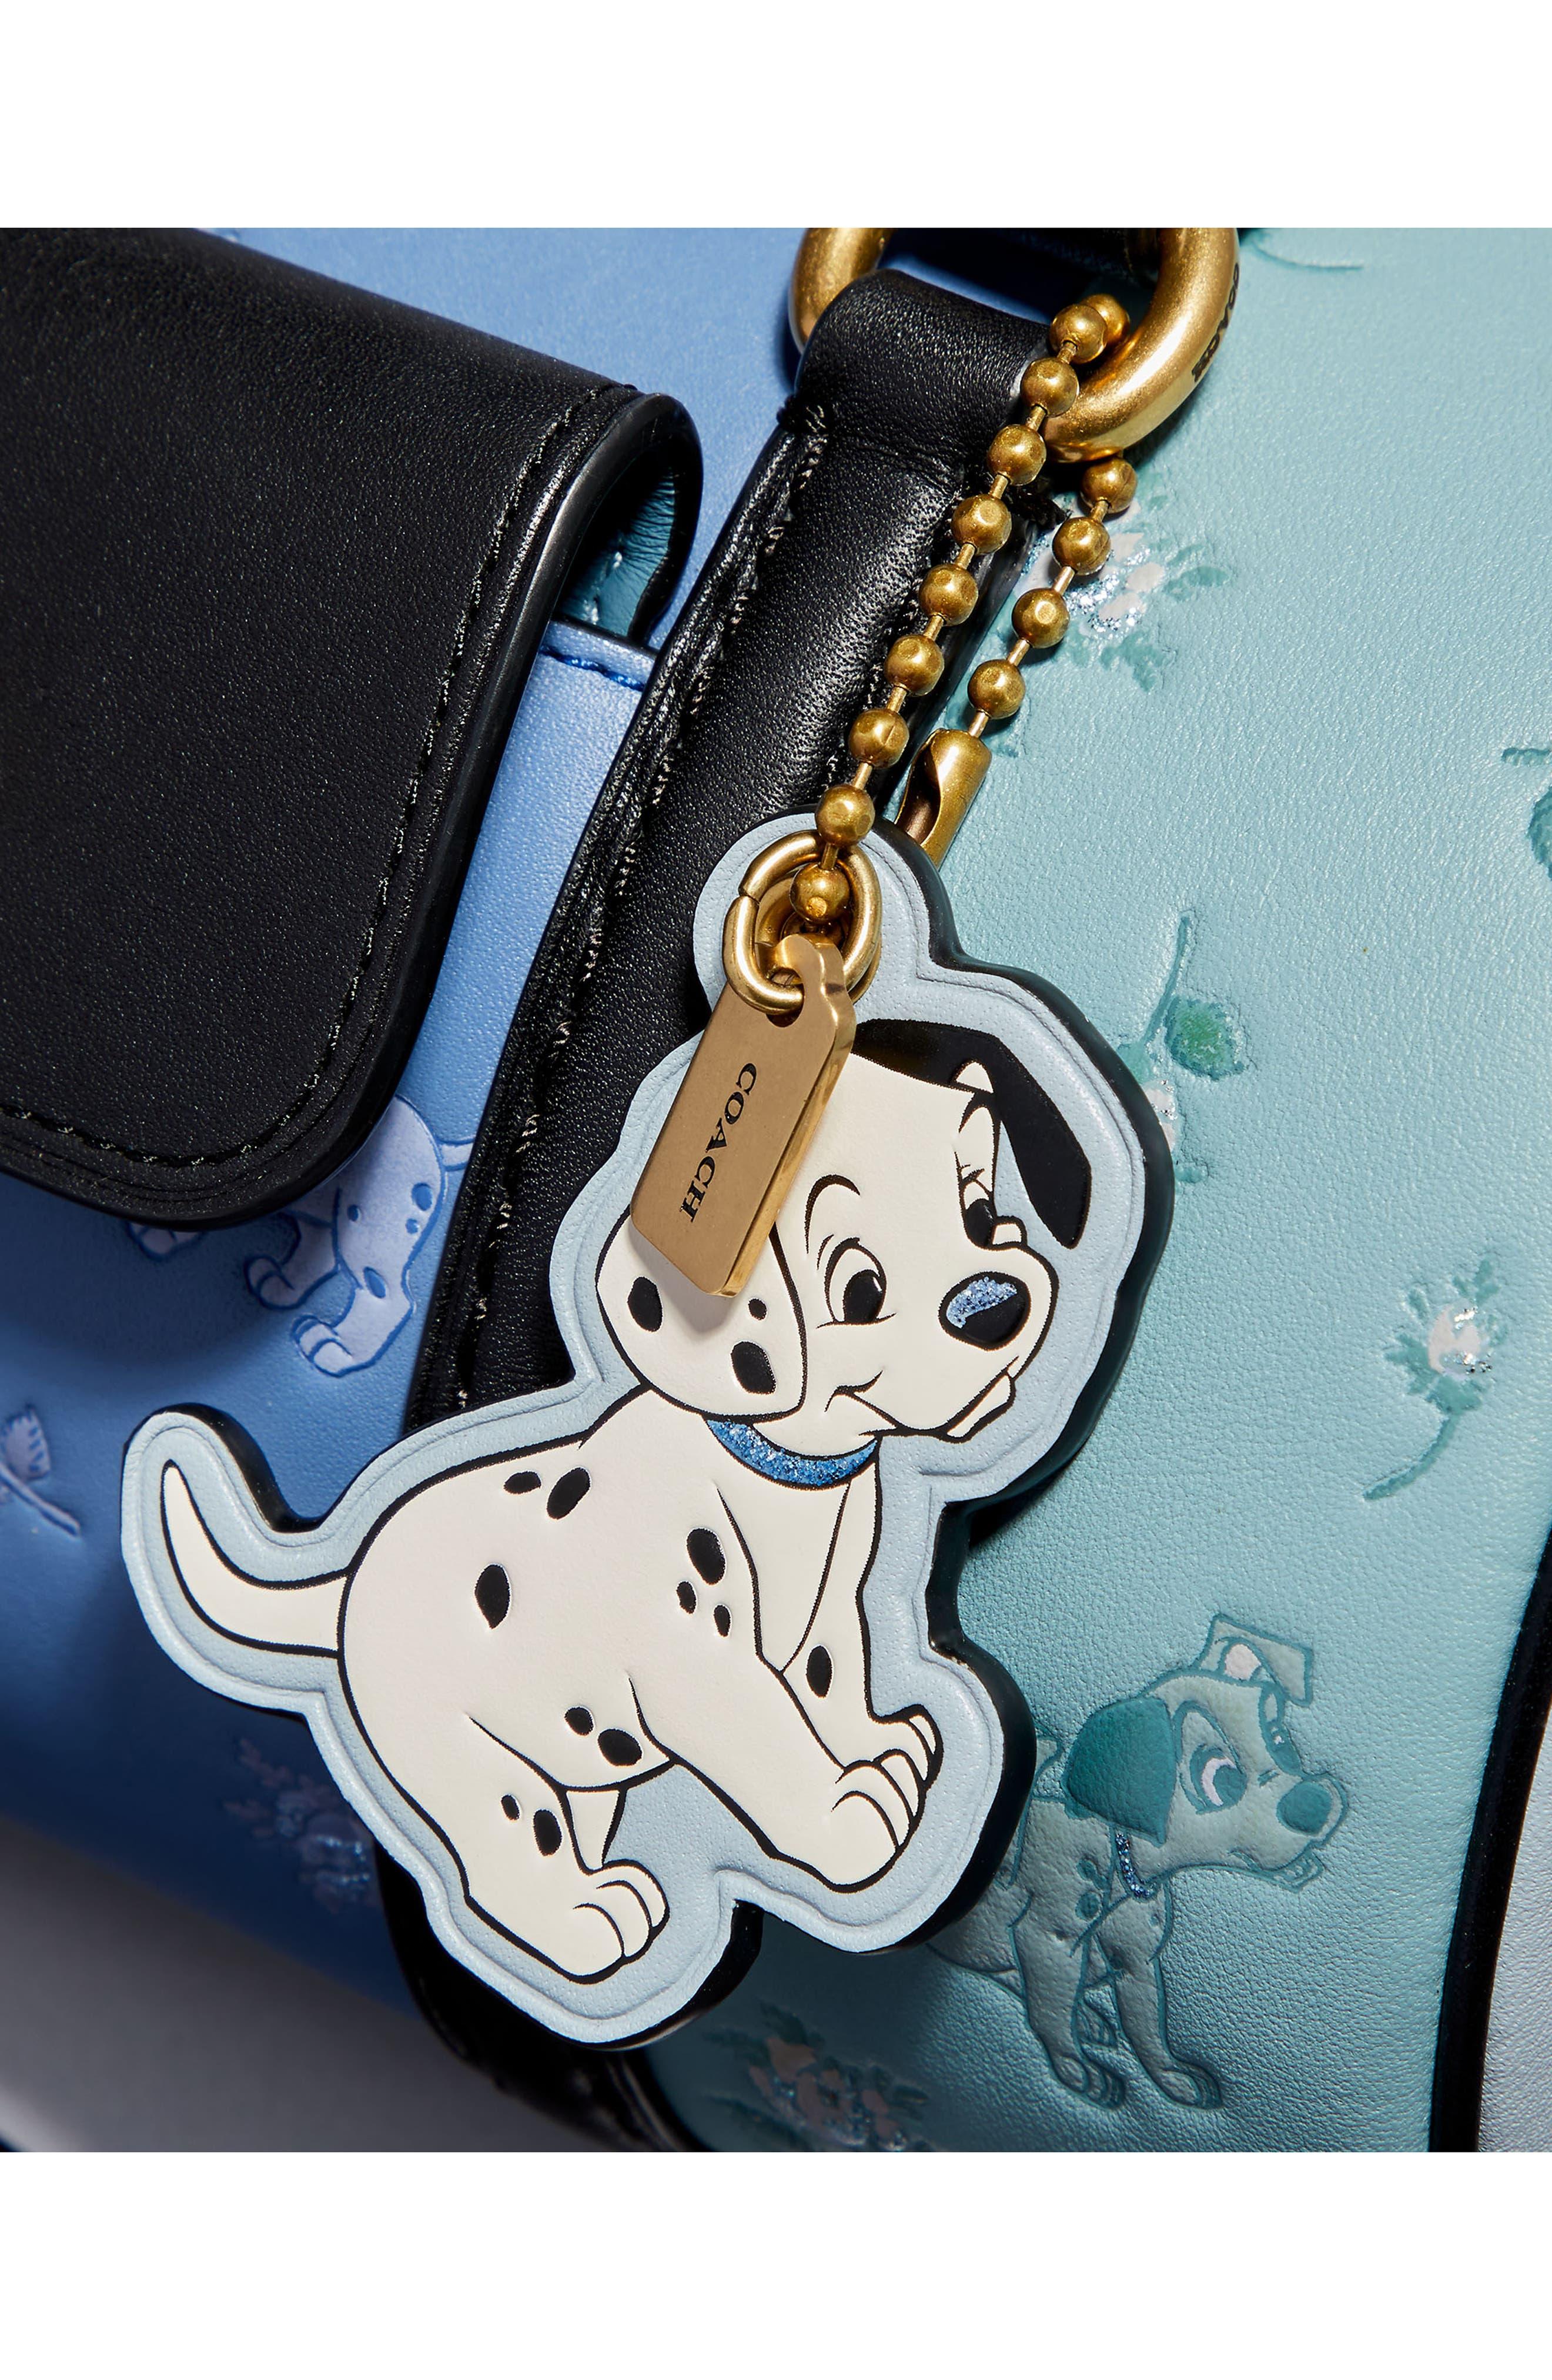 Disney x COACH 101 Dalmatians Leather Barrel Bag,                             Alternate thumbnail 7, color,                             402